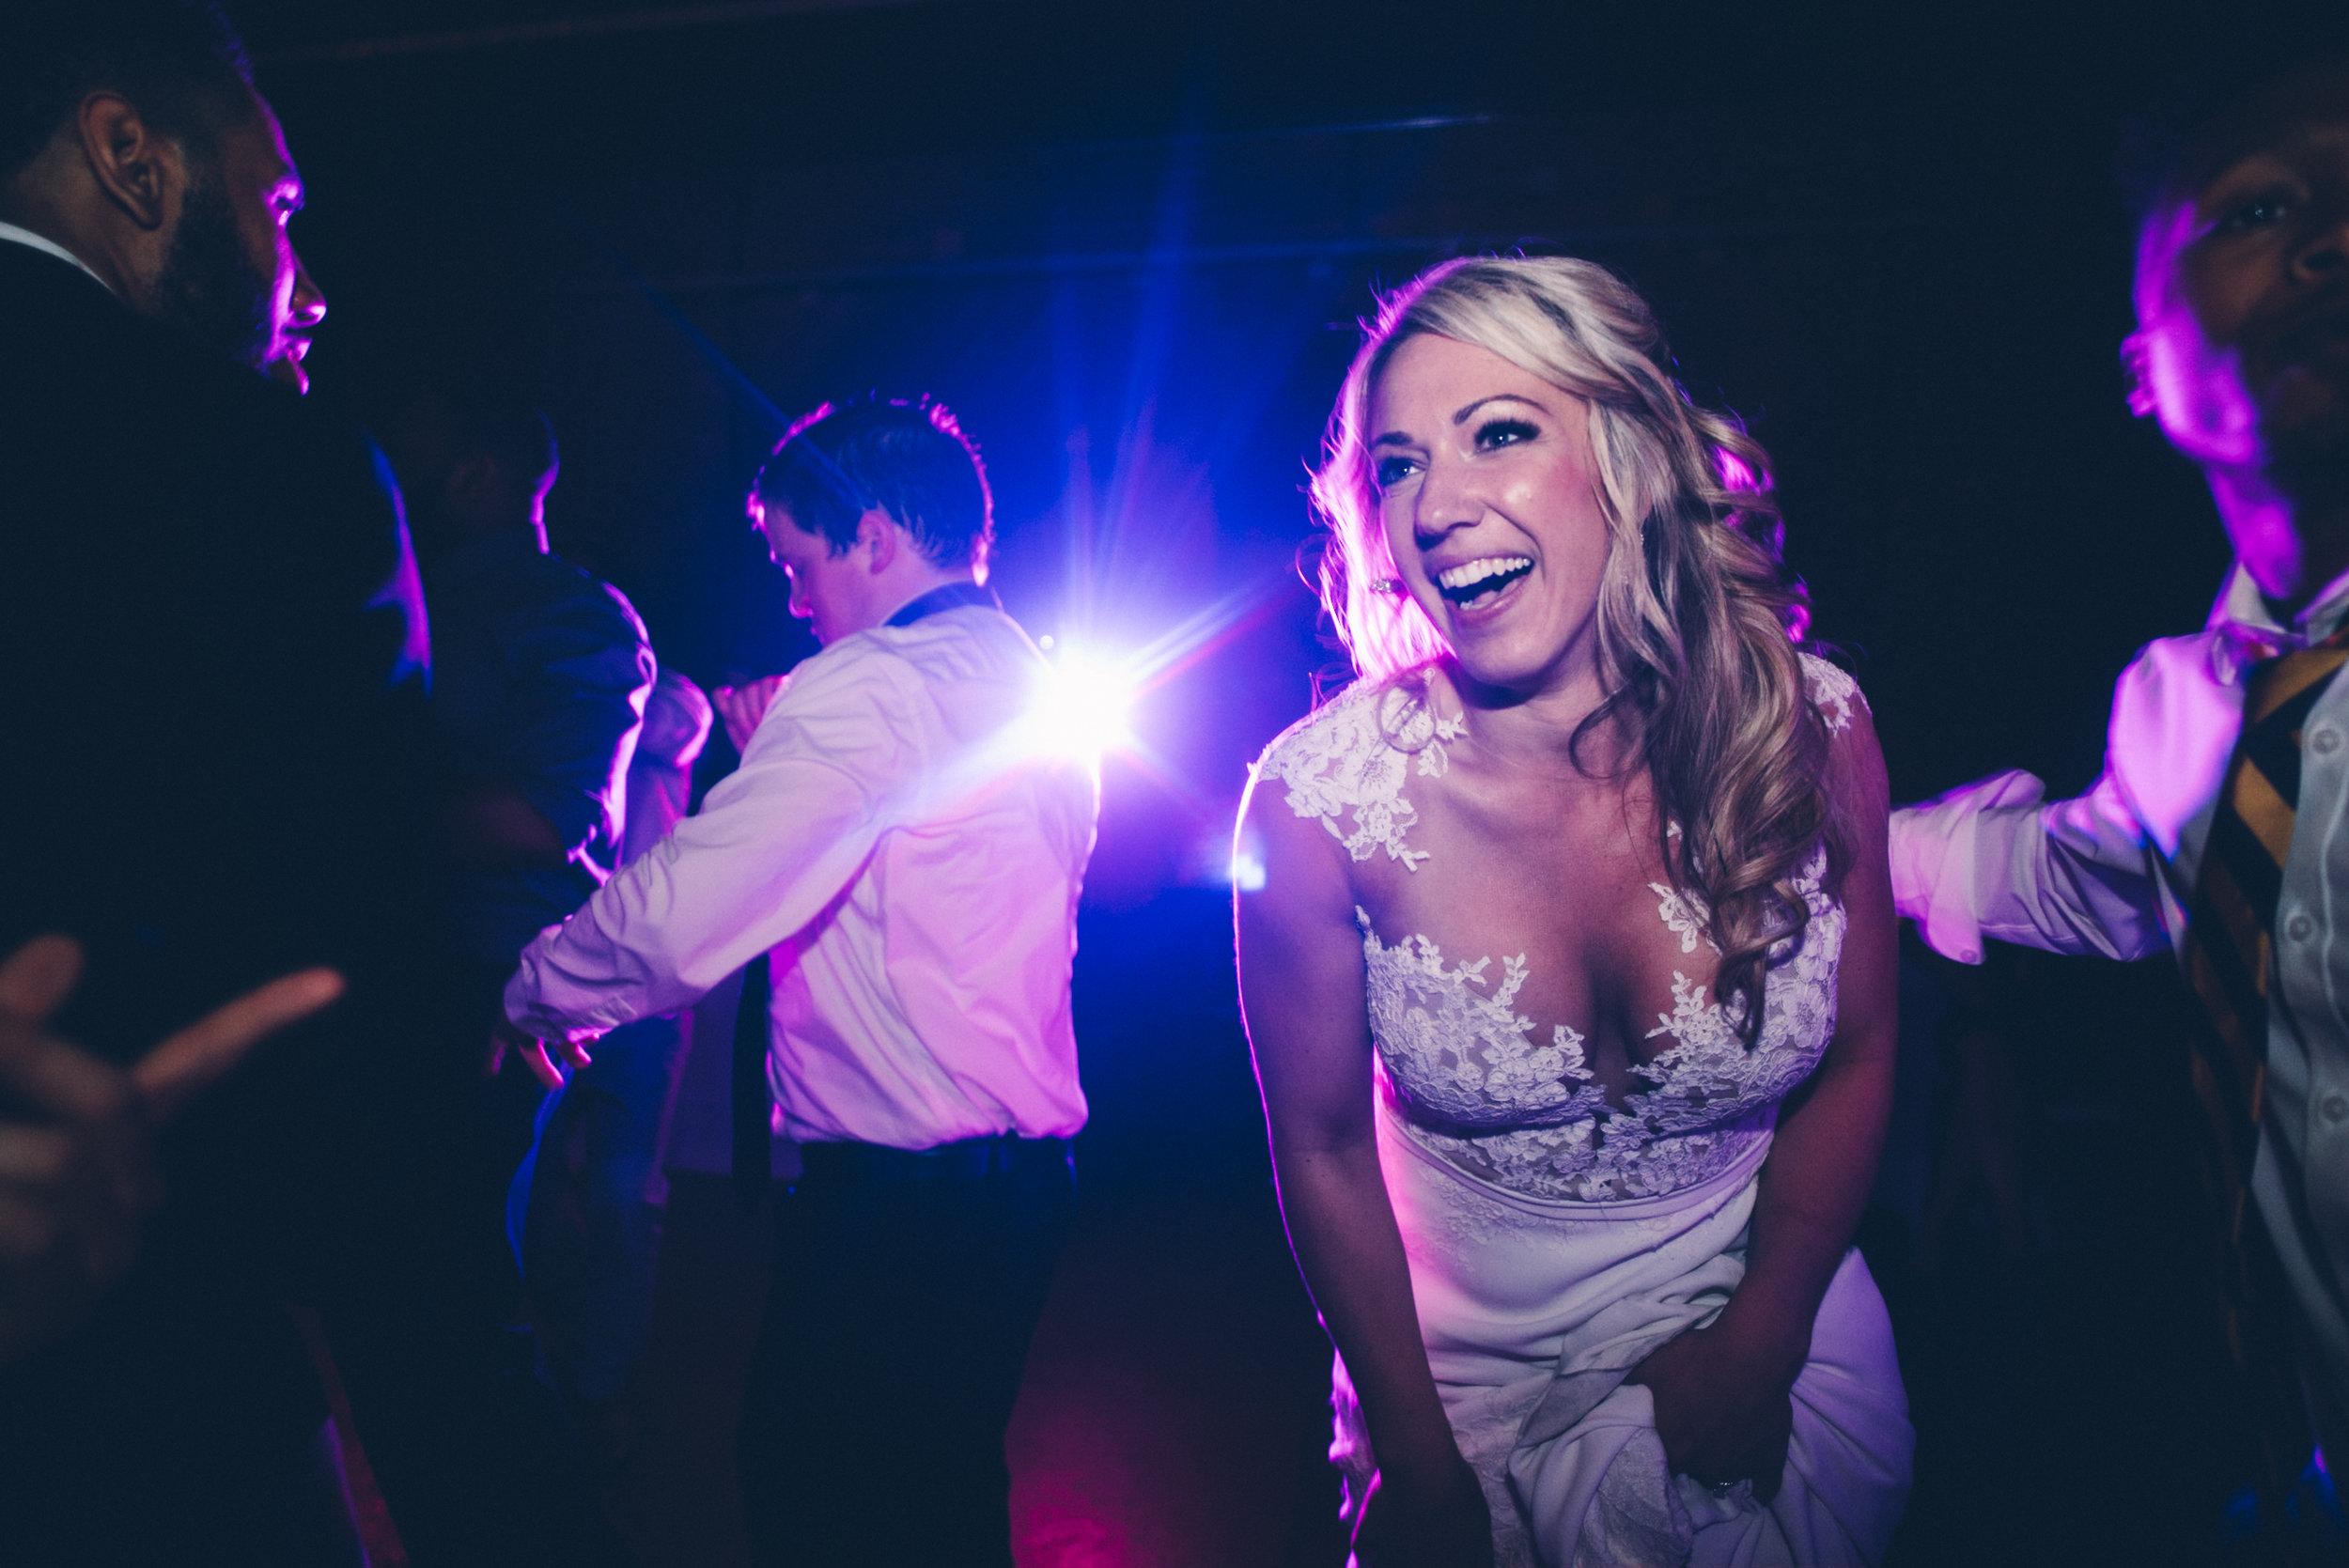 Pittsburgh Pennsylvania New York NYC Wedding Photographer Photojournalist Luxury Downtown Opera - Stirpe 1693.jpg